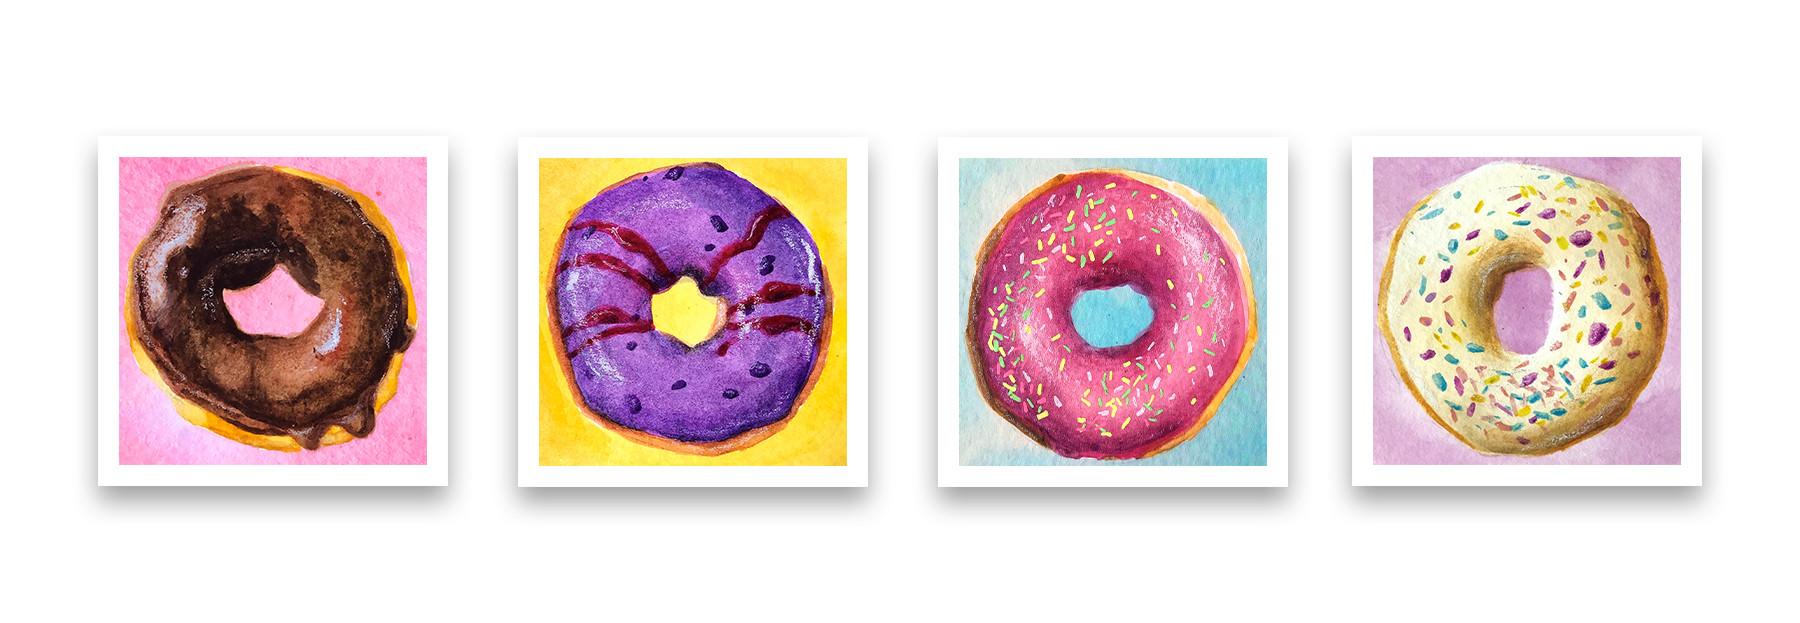 Doughnut set.jpg